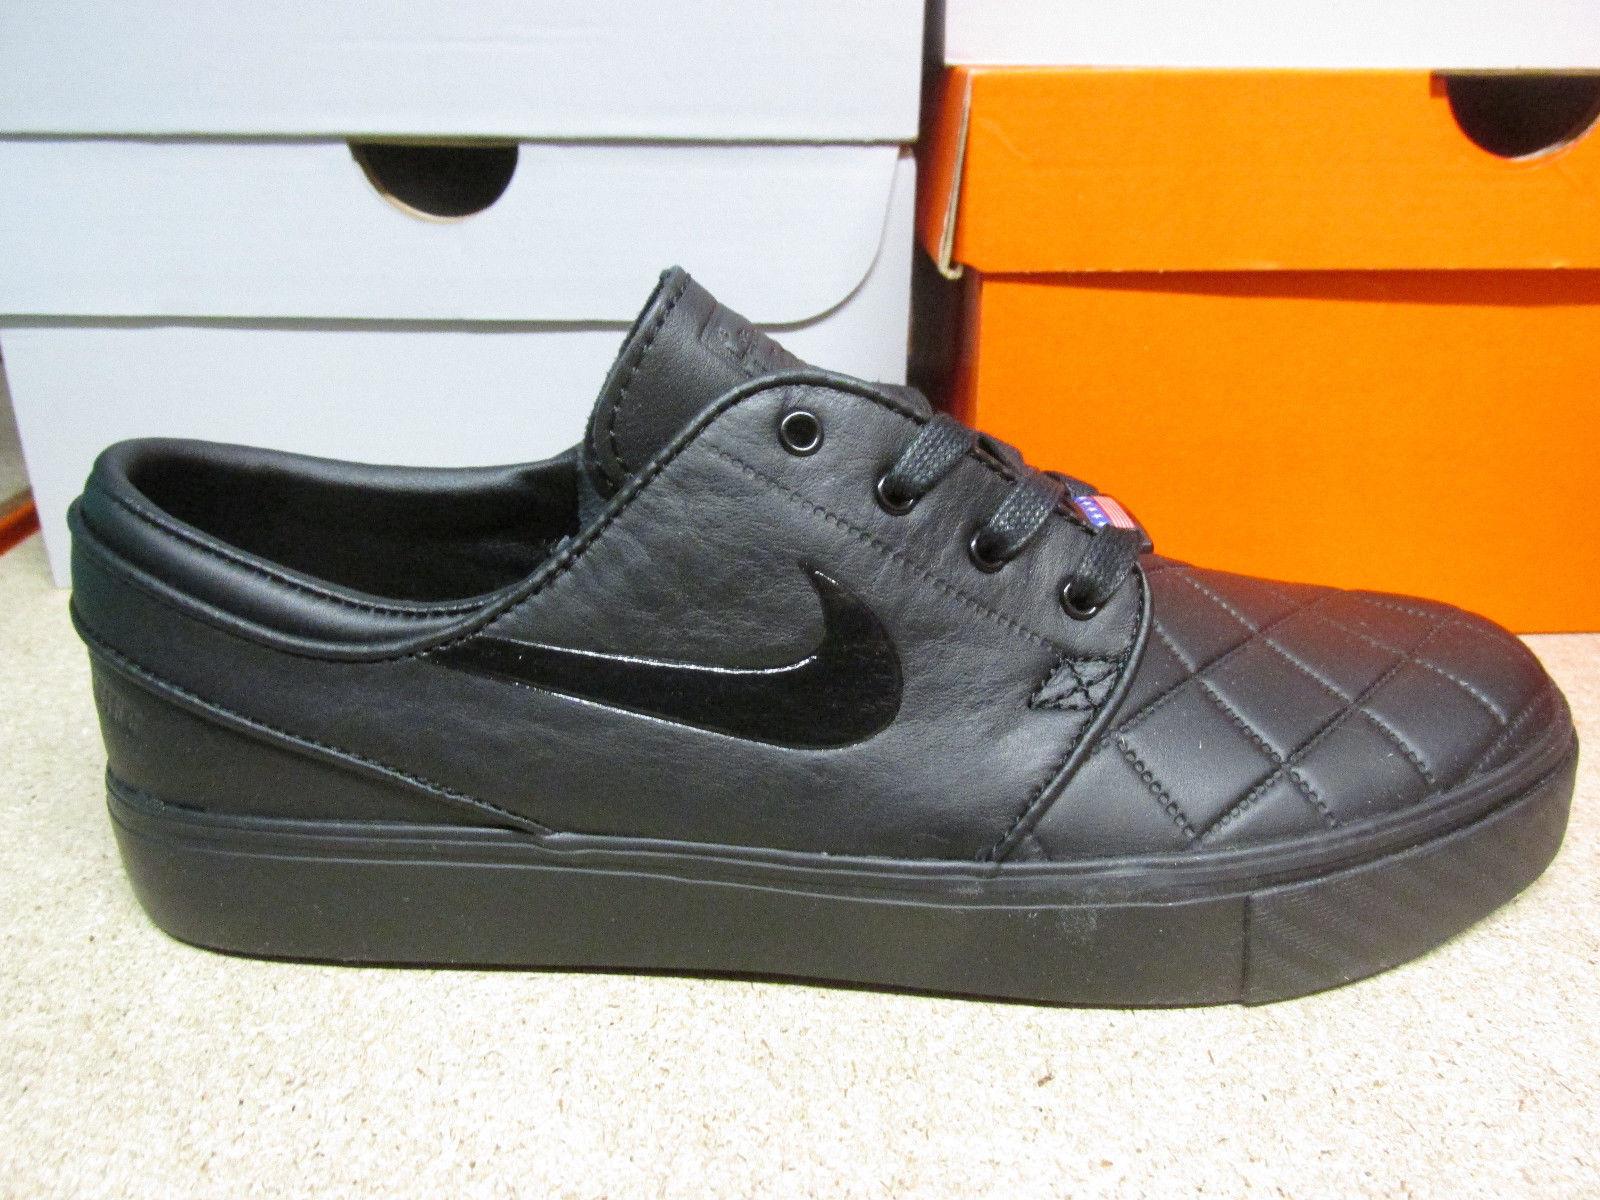 huge selection of 4a223 68c90 купить Nike Stefan Janoski floral, с доставкой Nike SB Zoom Stefan Janoski  ELT SBXFB Mens